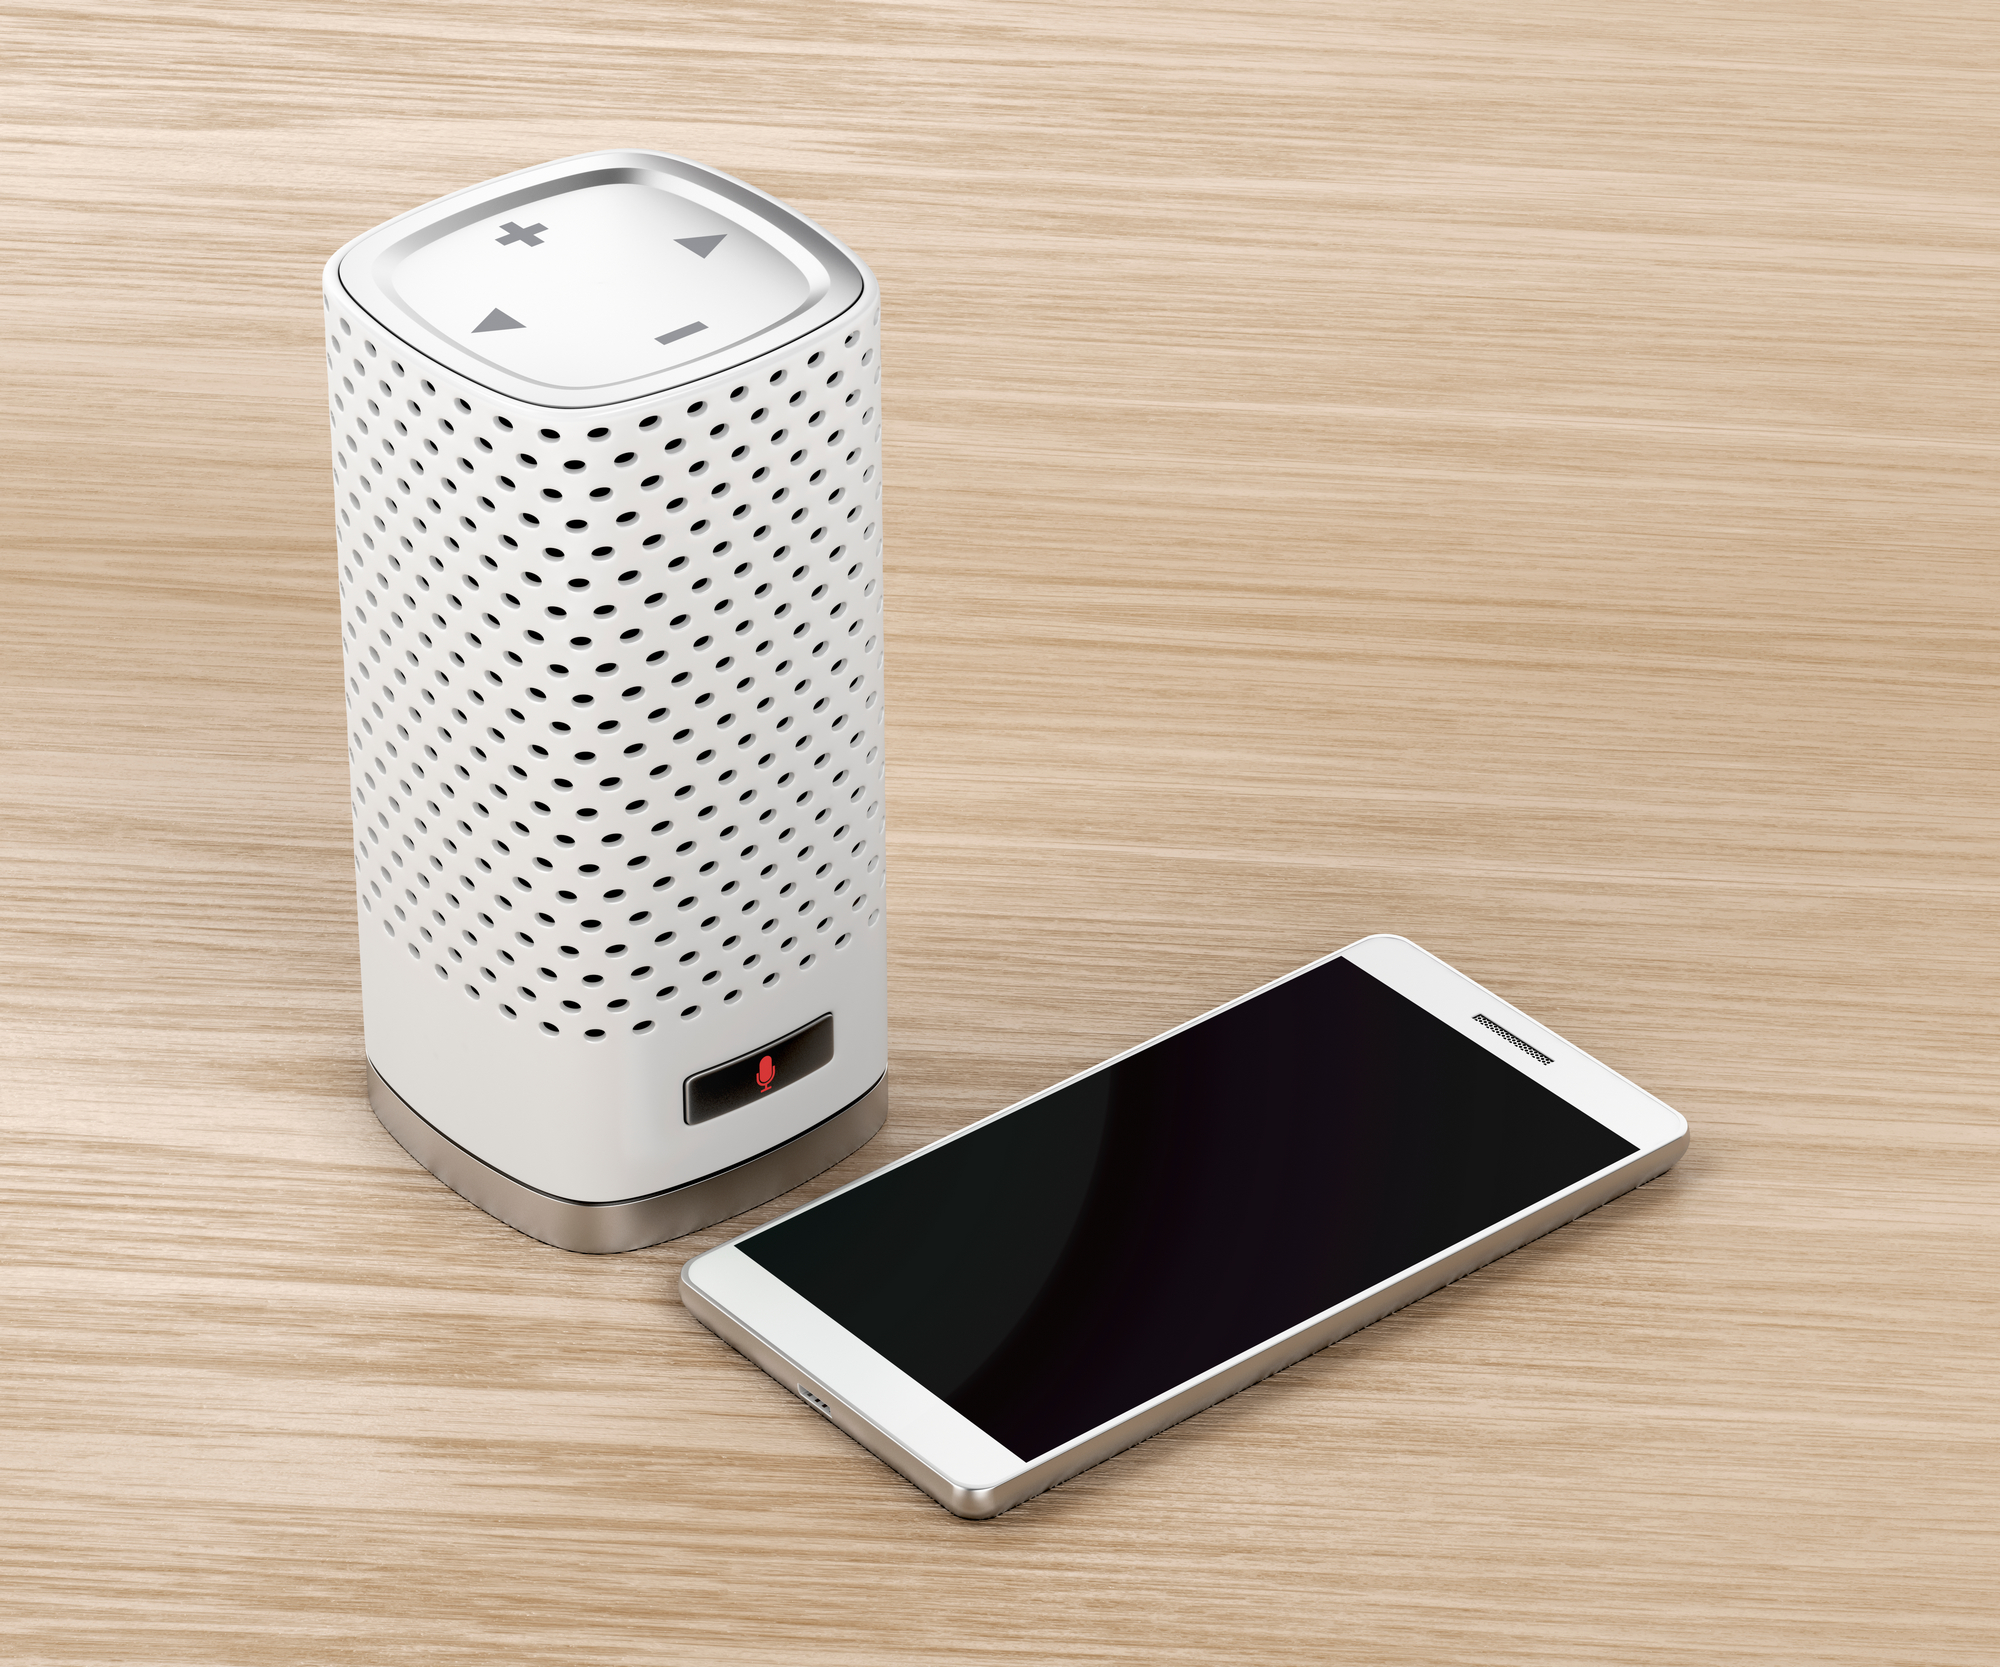 speaker-and-smartphone-on-wood-background-px4hs3u.jpg